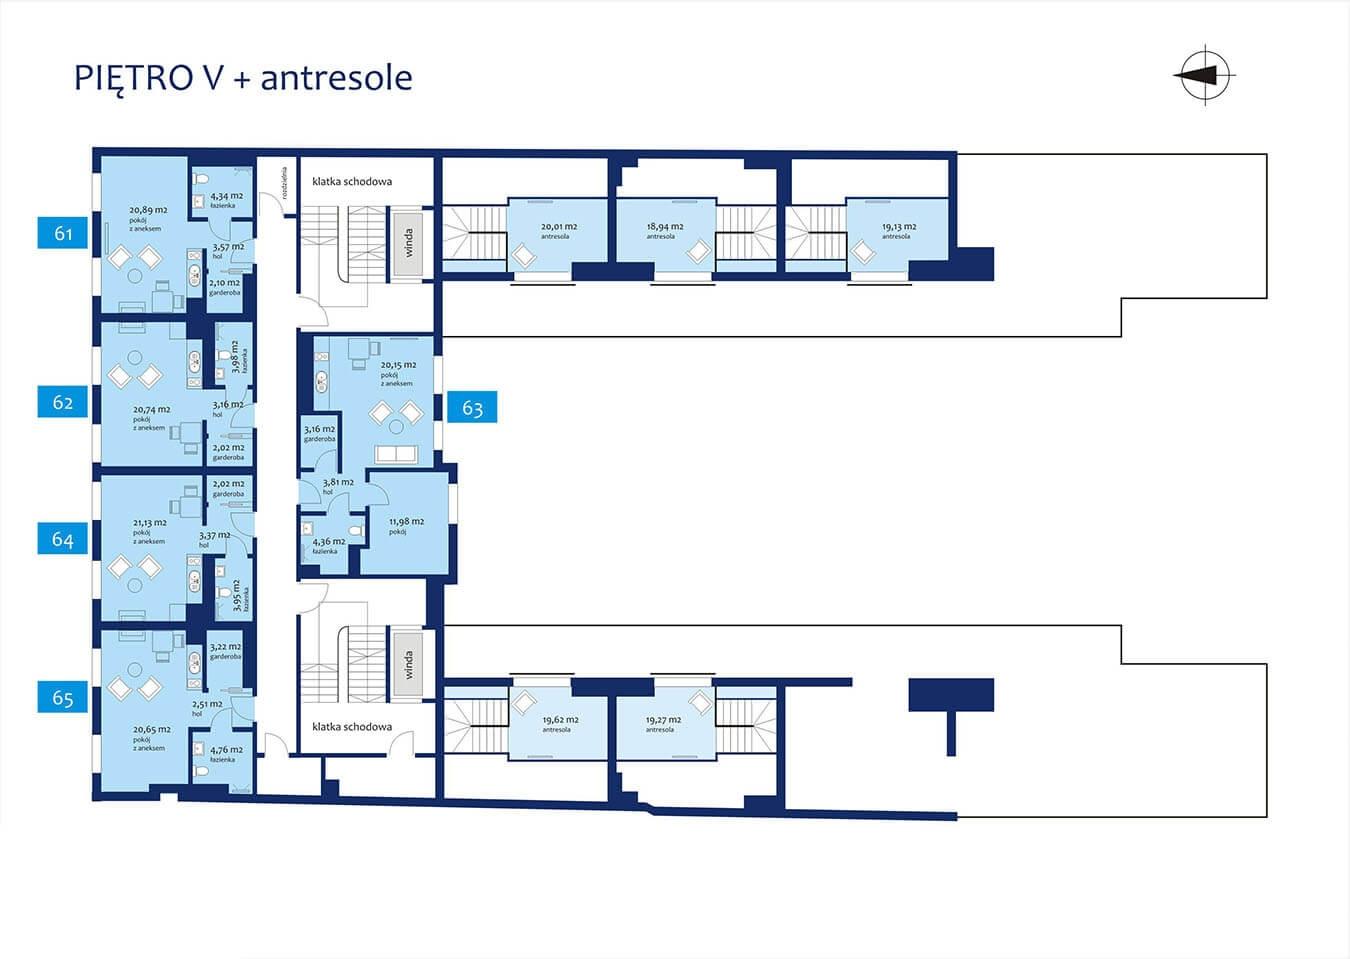 N23 - Piętro 5